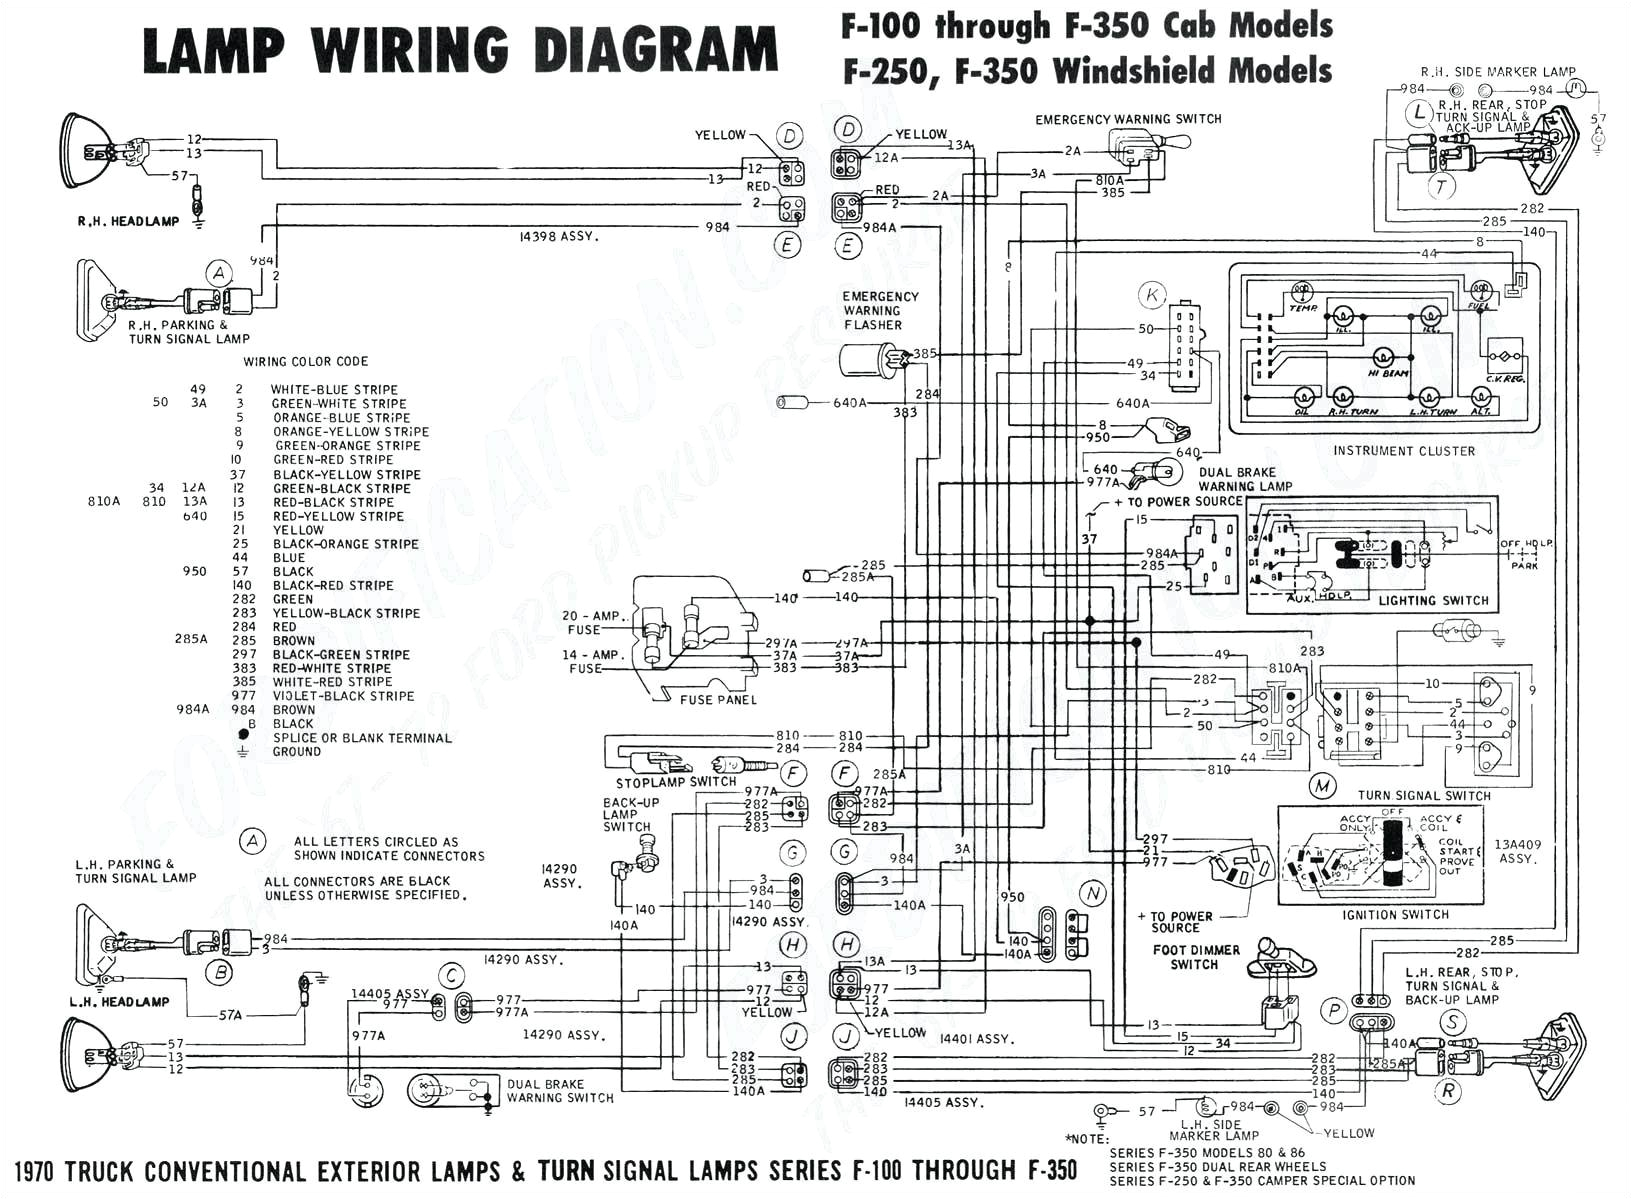 98 Civic Distributor Wiring Diagram 98 Civic Fuse Diagram Wiring Diagram Used